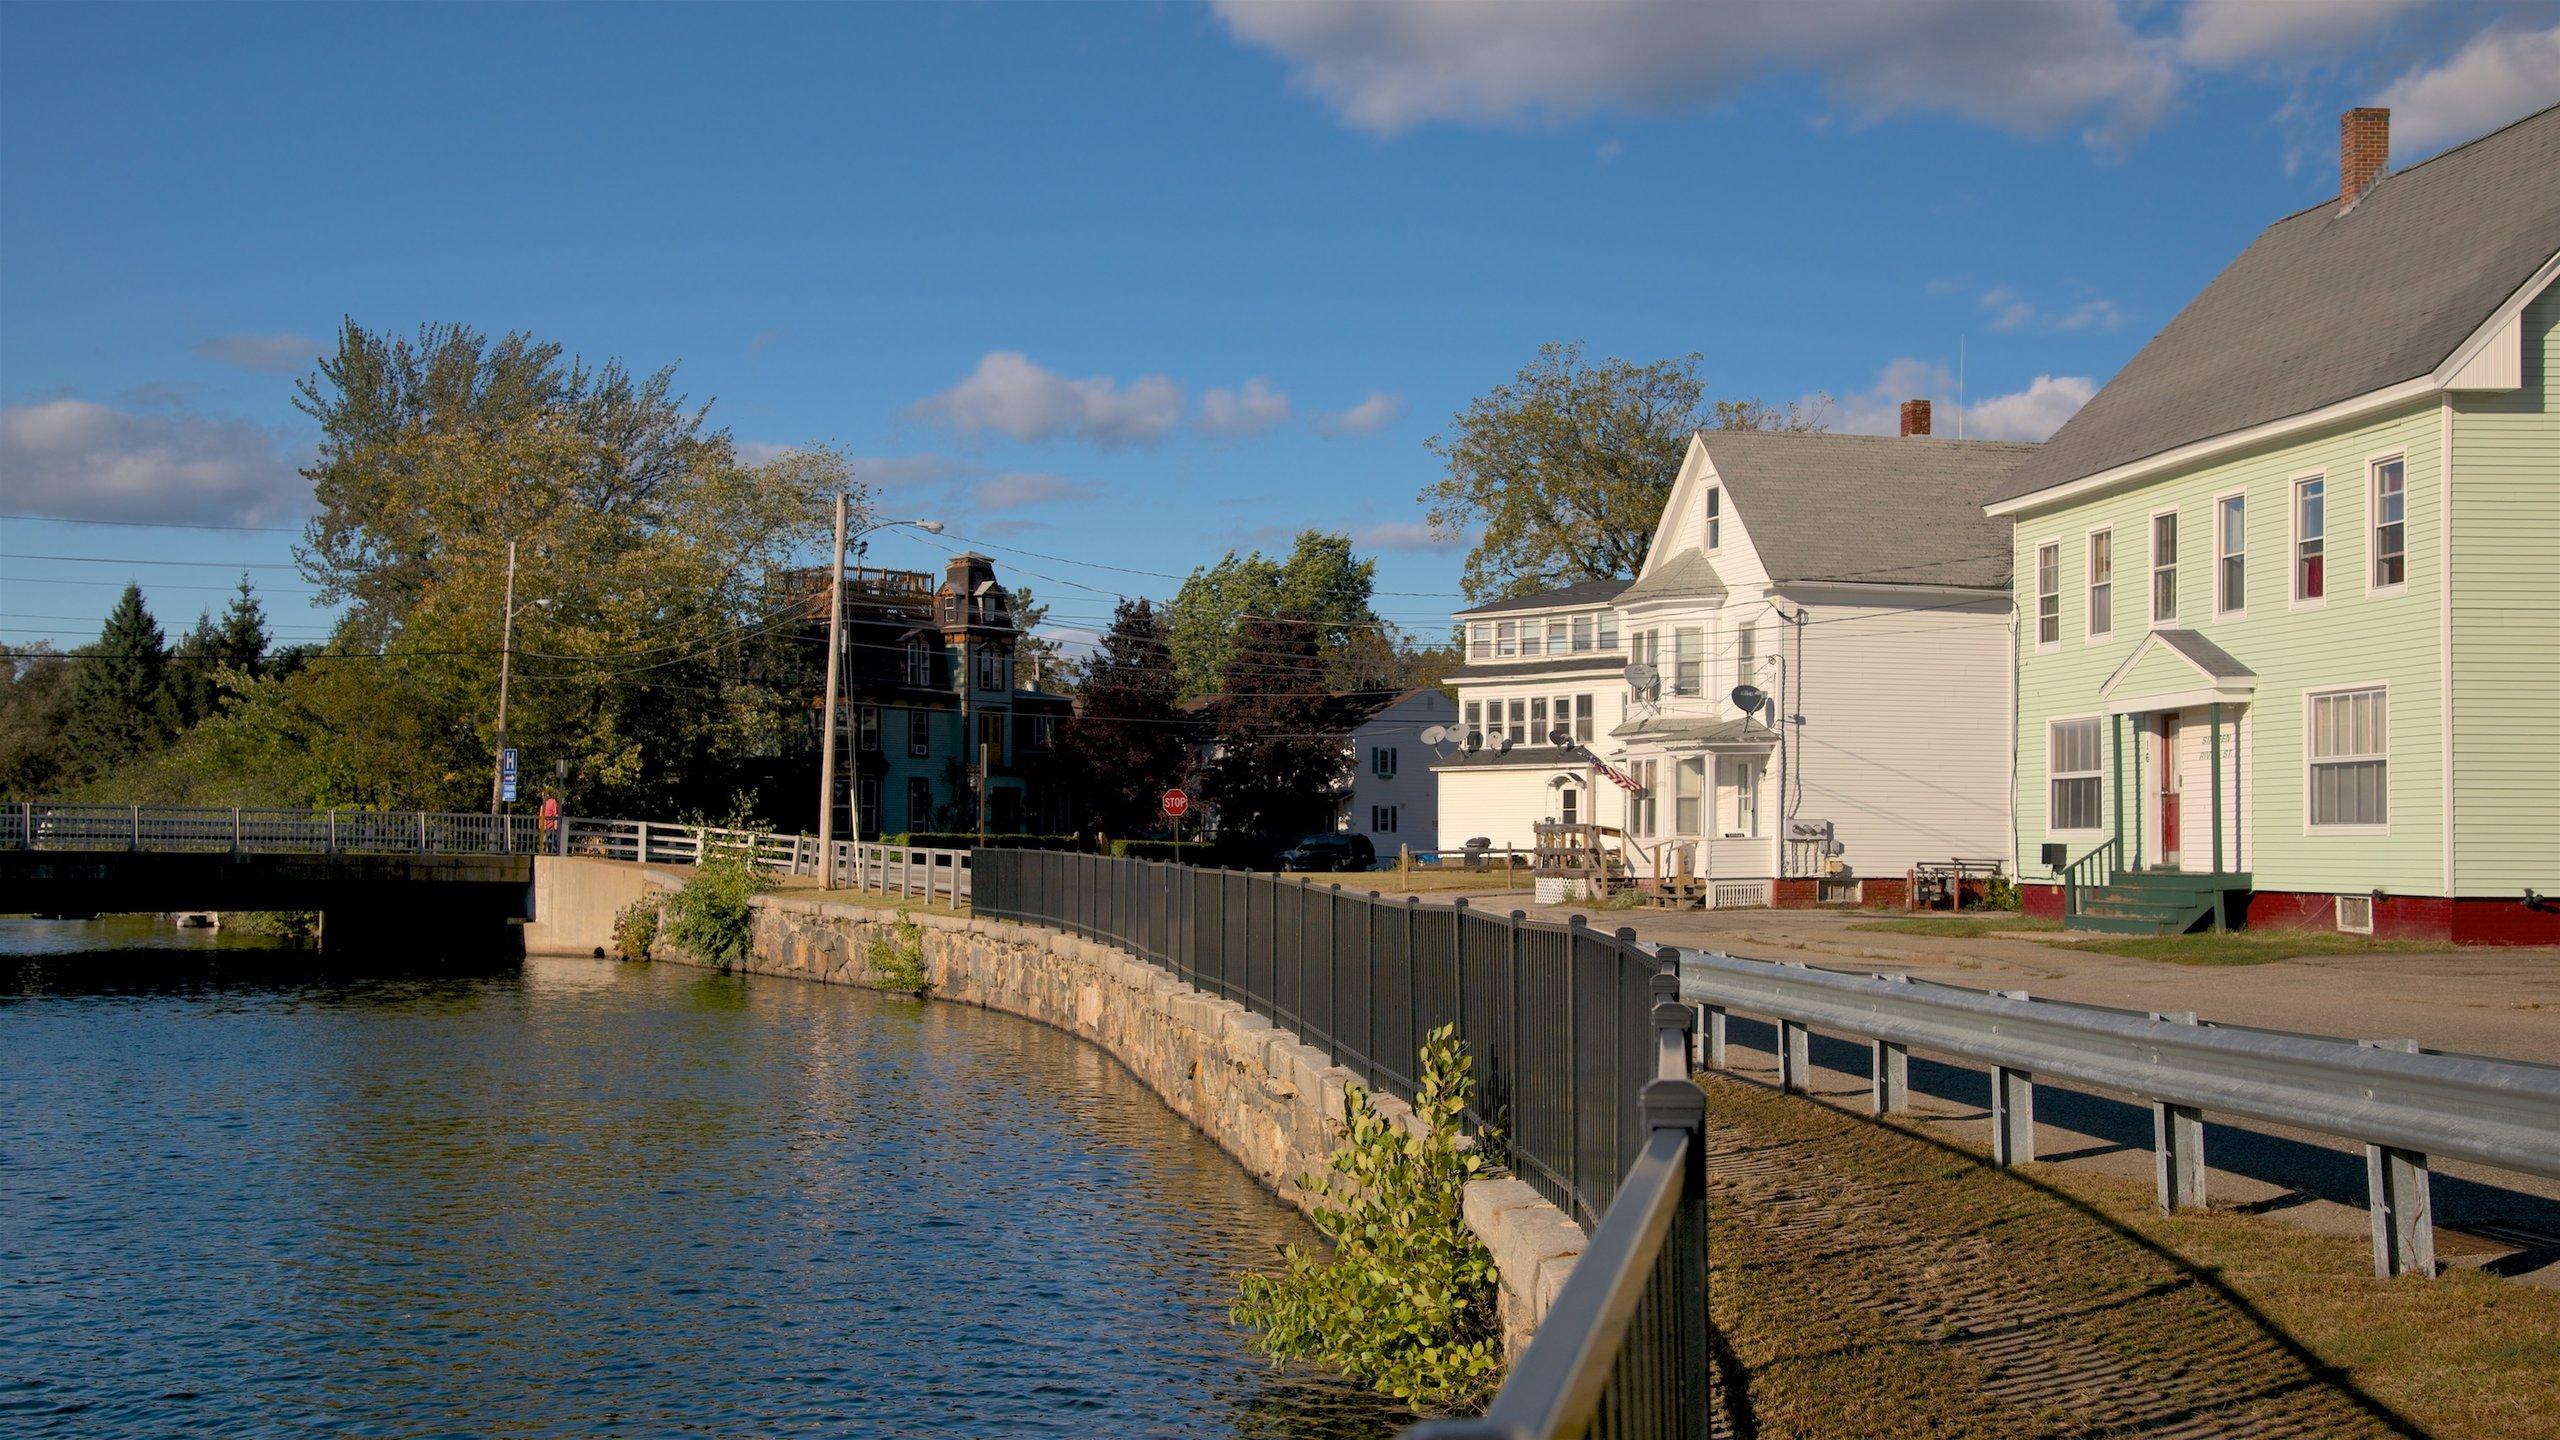 Laconia, New Hampshire, United States of America